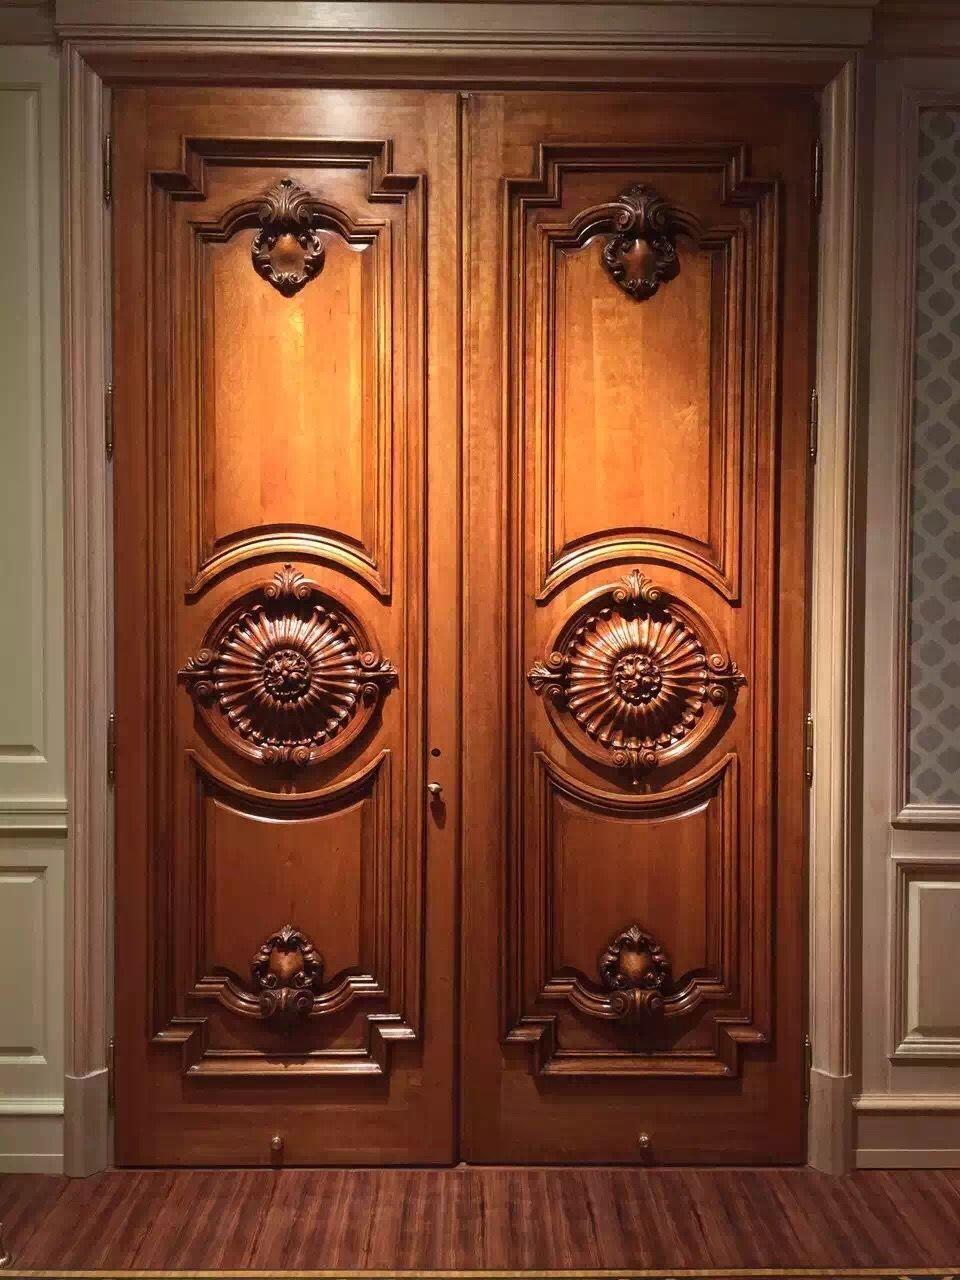 Pin By Galaxy Art On Doors Doors Wood Doors Double Door Design Wooden Main Door Wooden Main Door Design Double Door Design